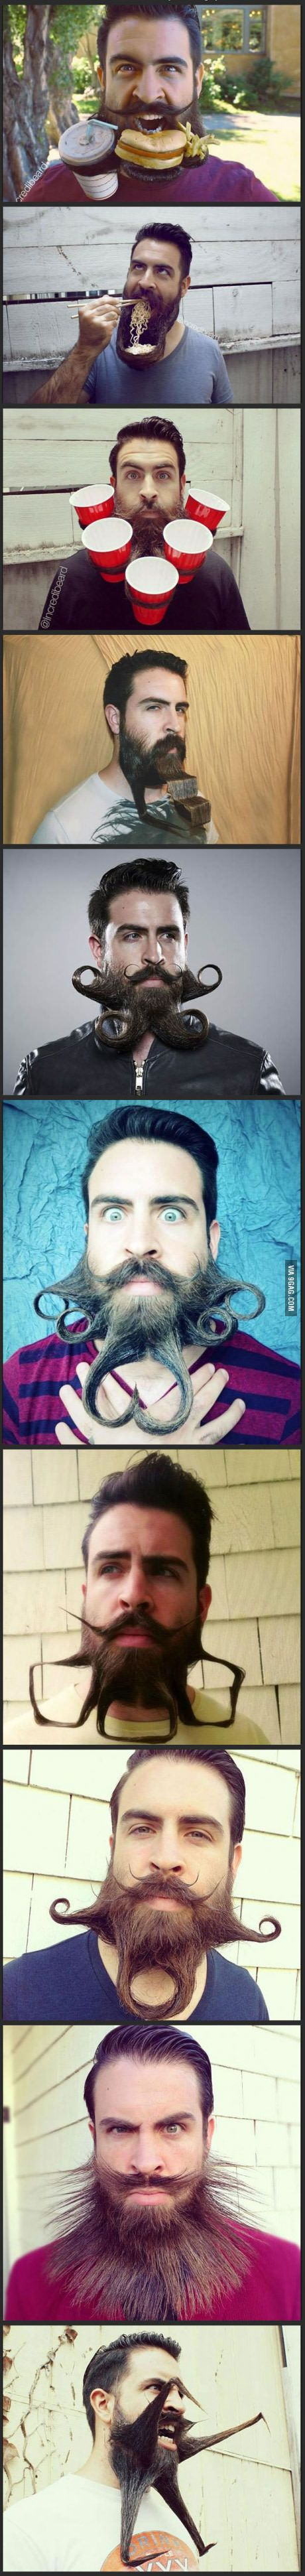 In honor of no shave November, crazy beard guy!